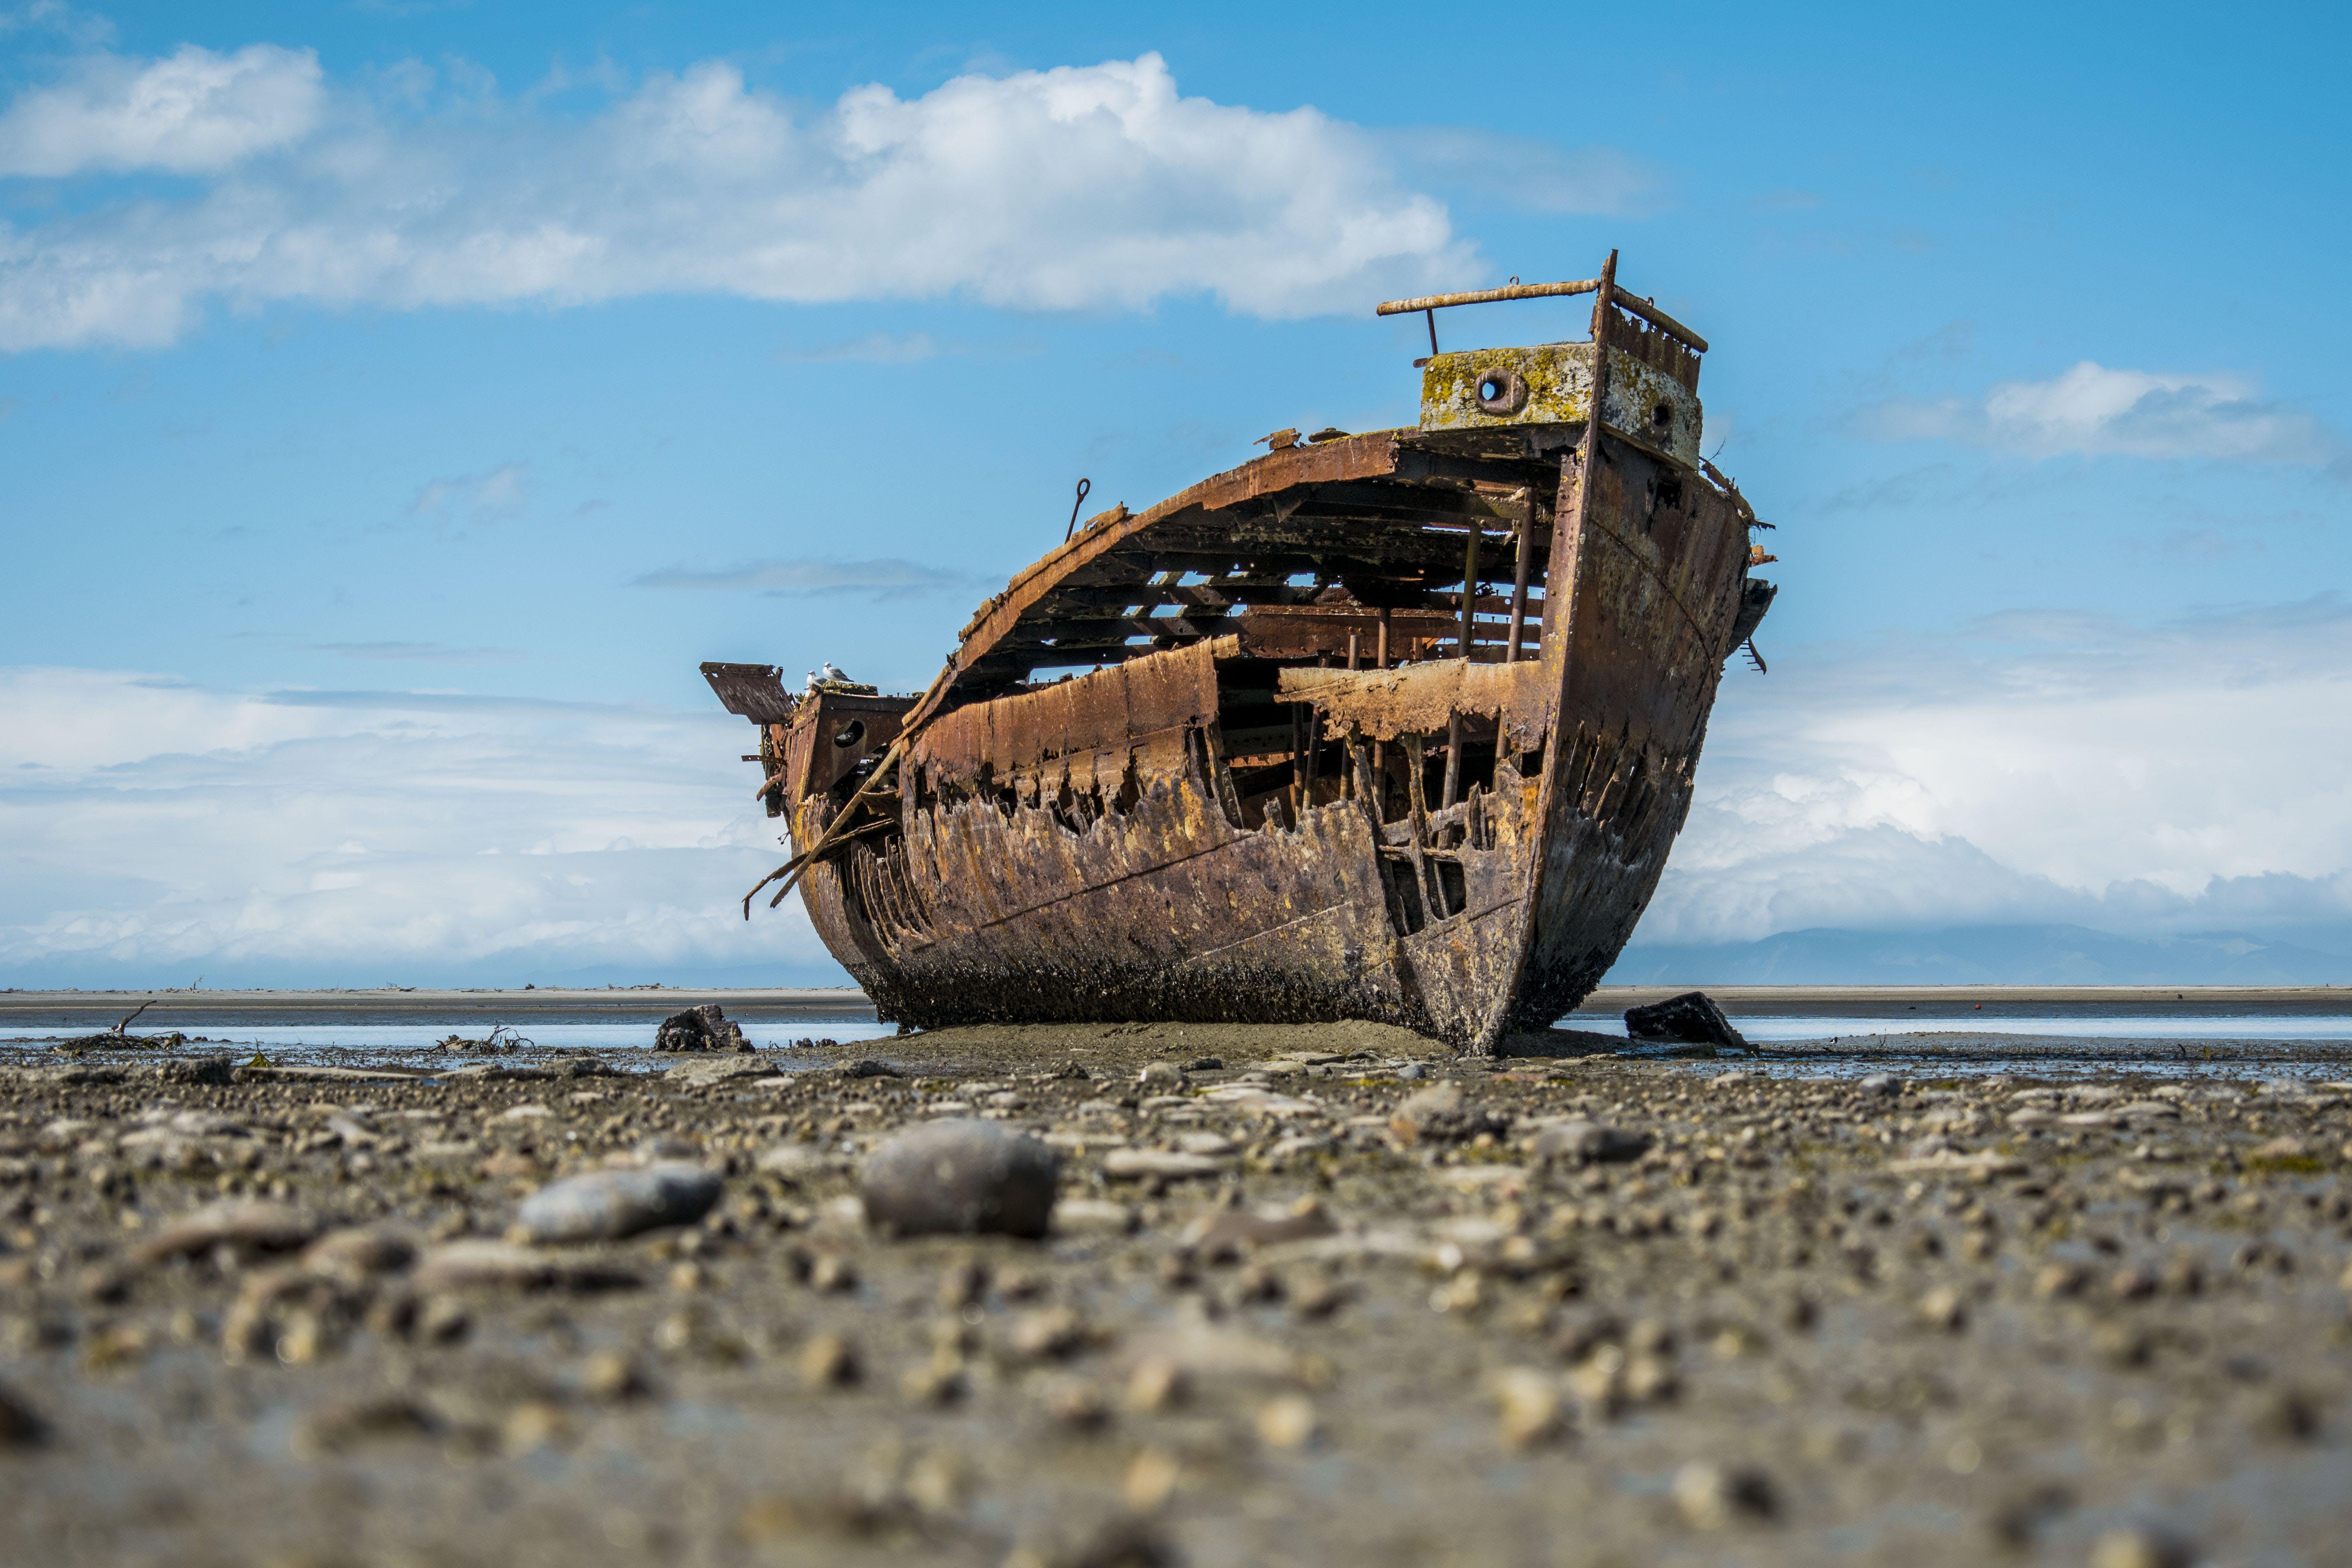 Kostenloses Stock Foto zu kaputt, meeresküste, neuseeland, rostig